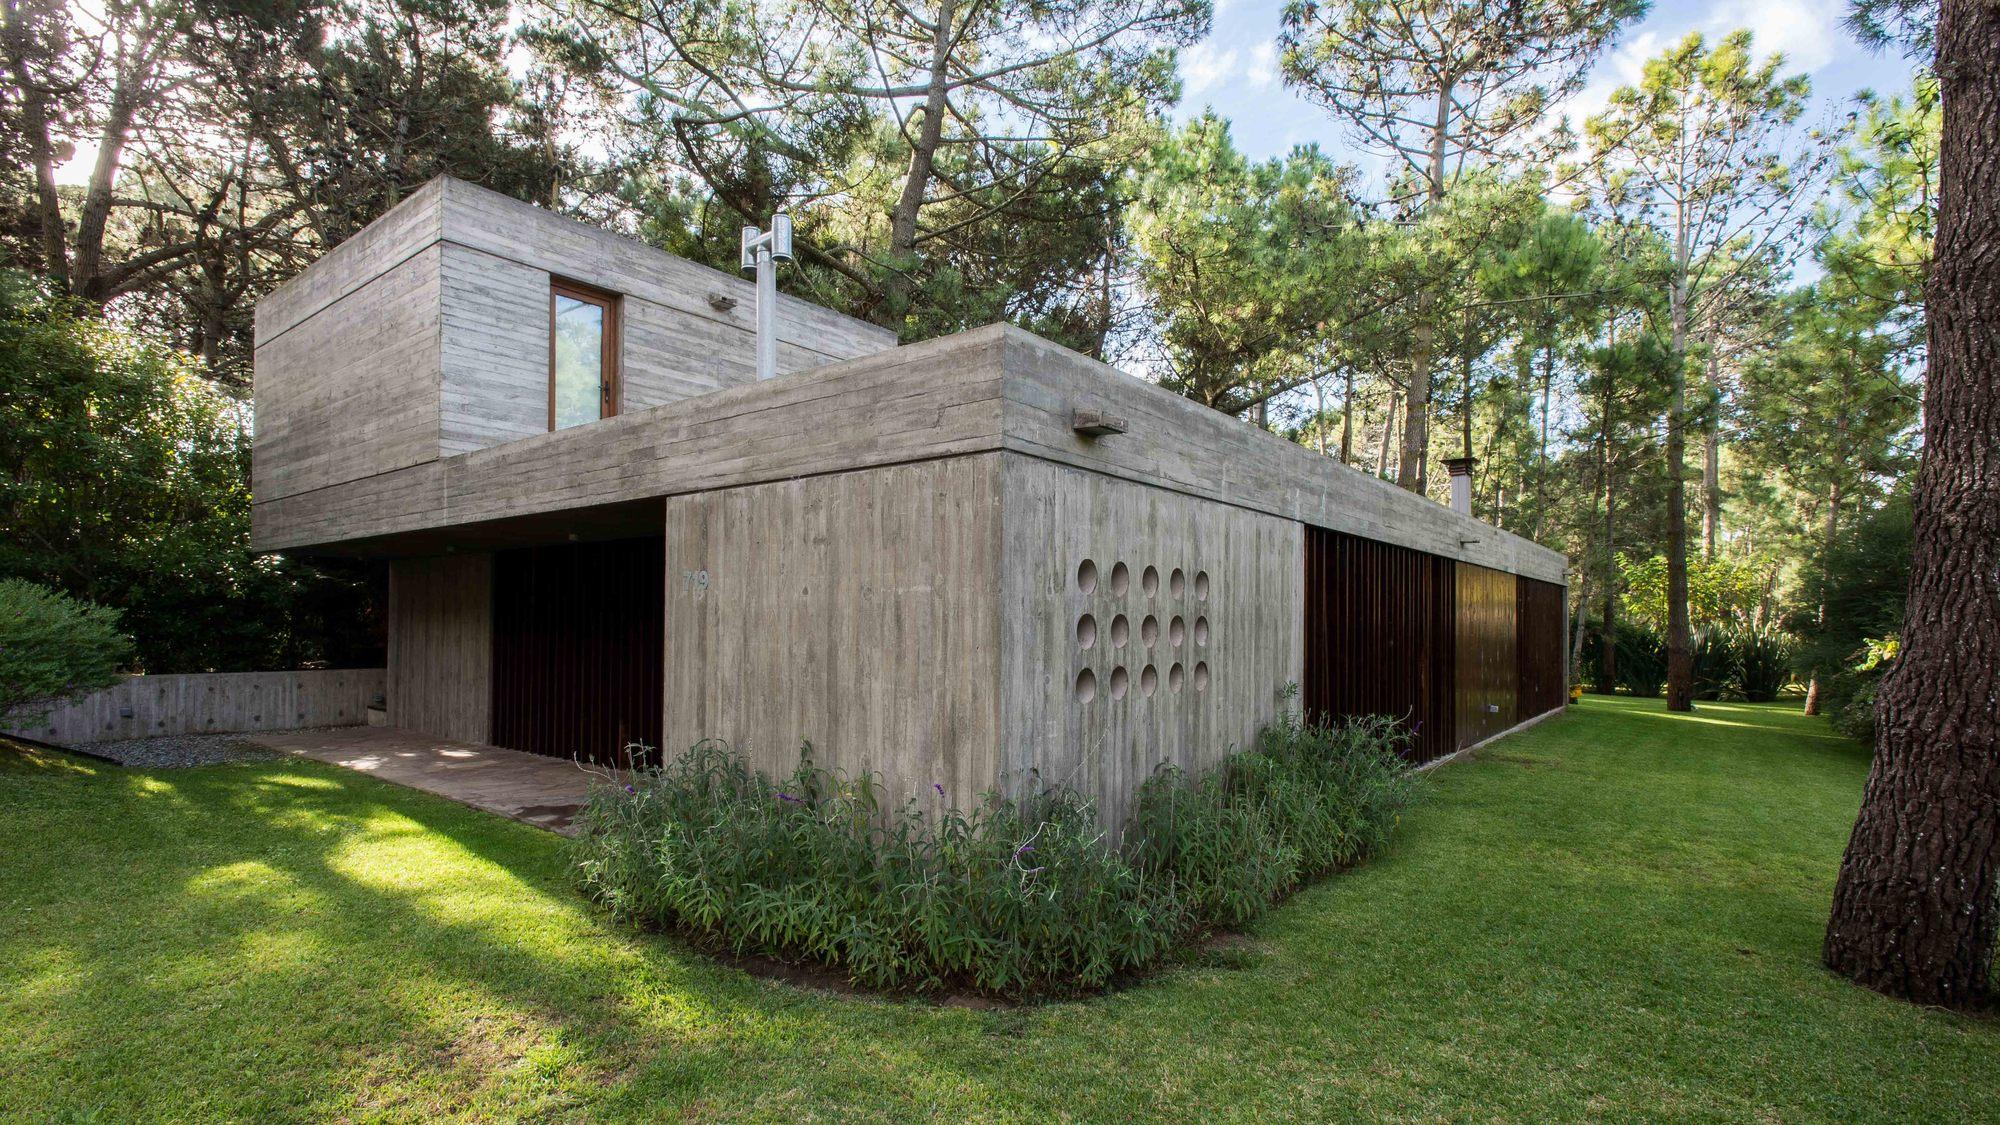 Casa f gianserra lima arquitectos plataforma for Casa minimalista lima